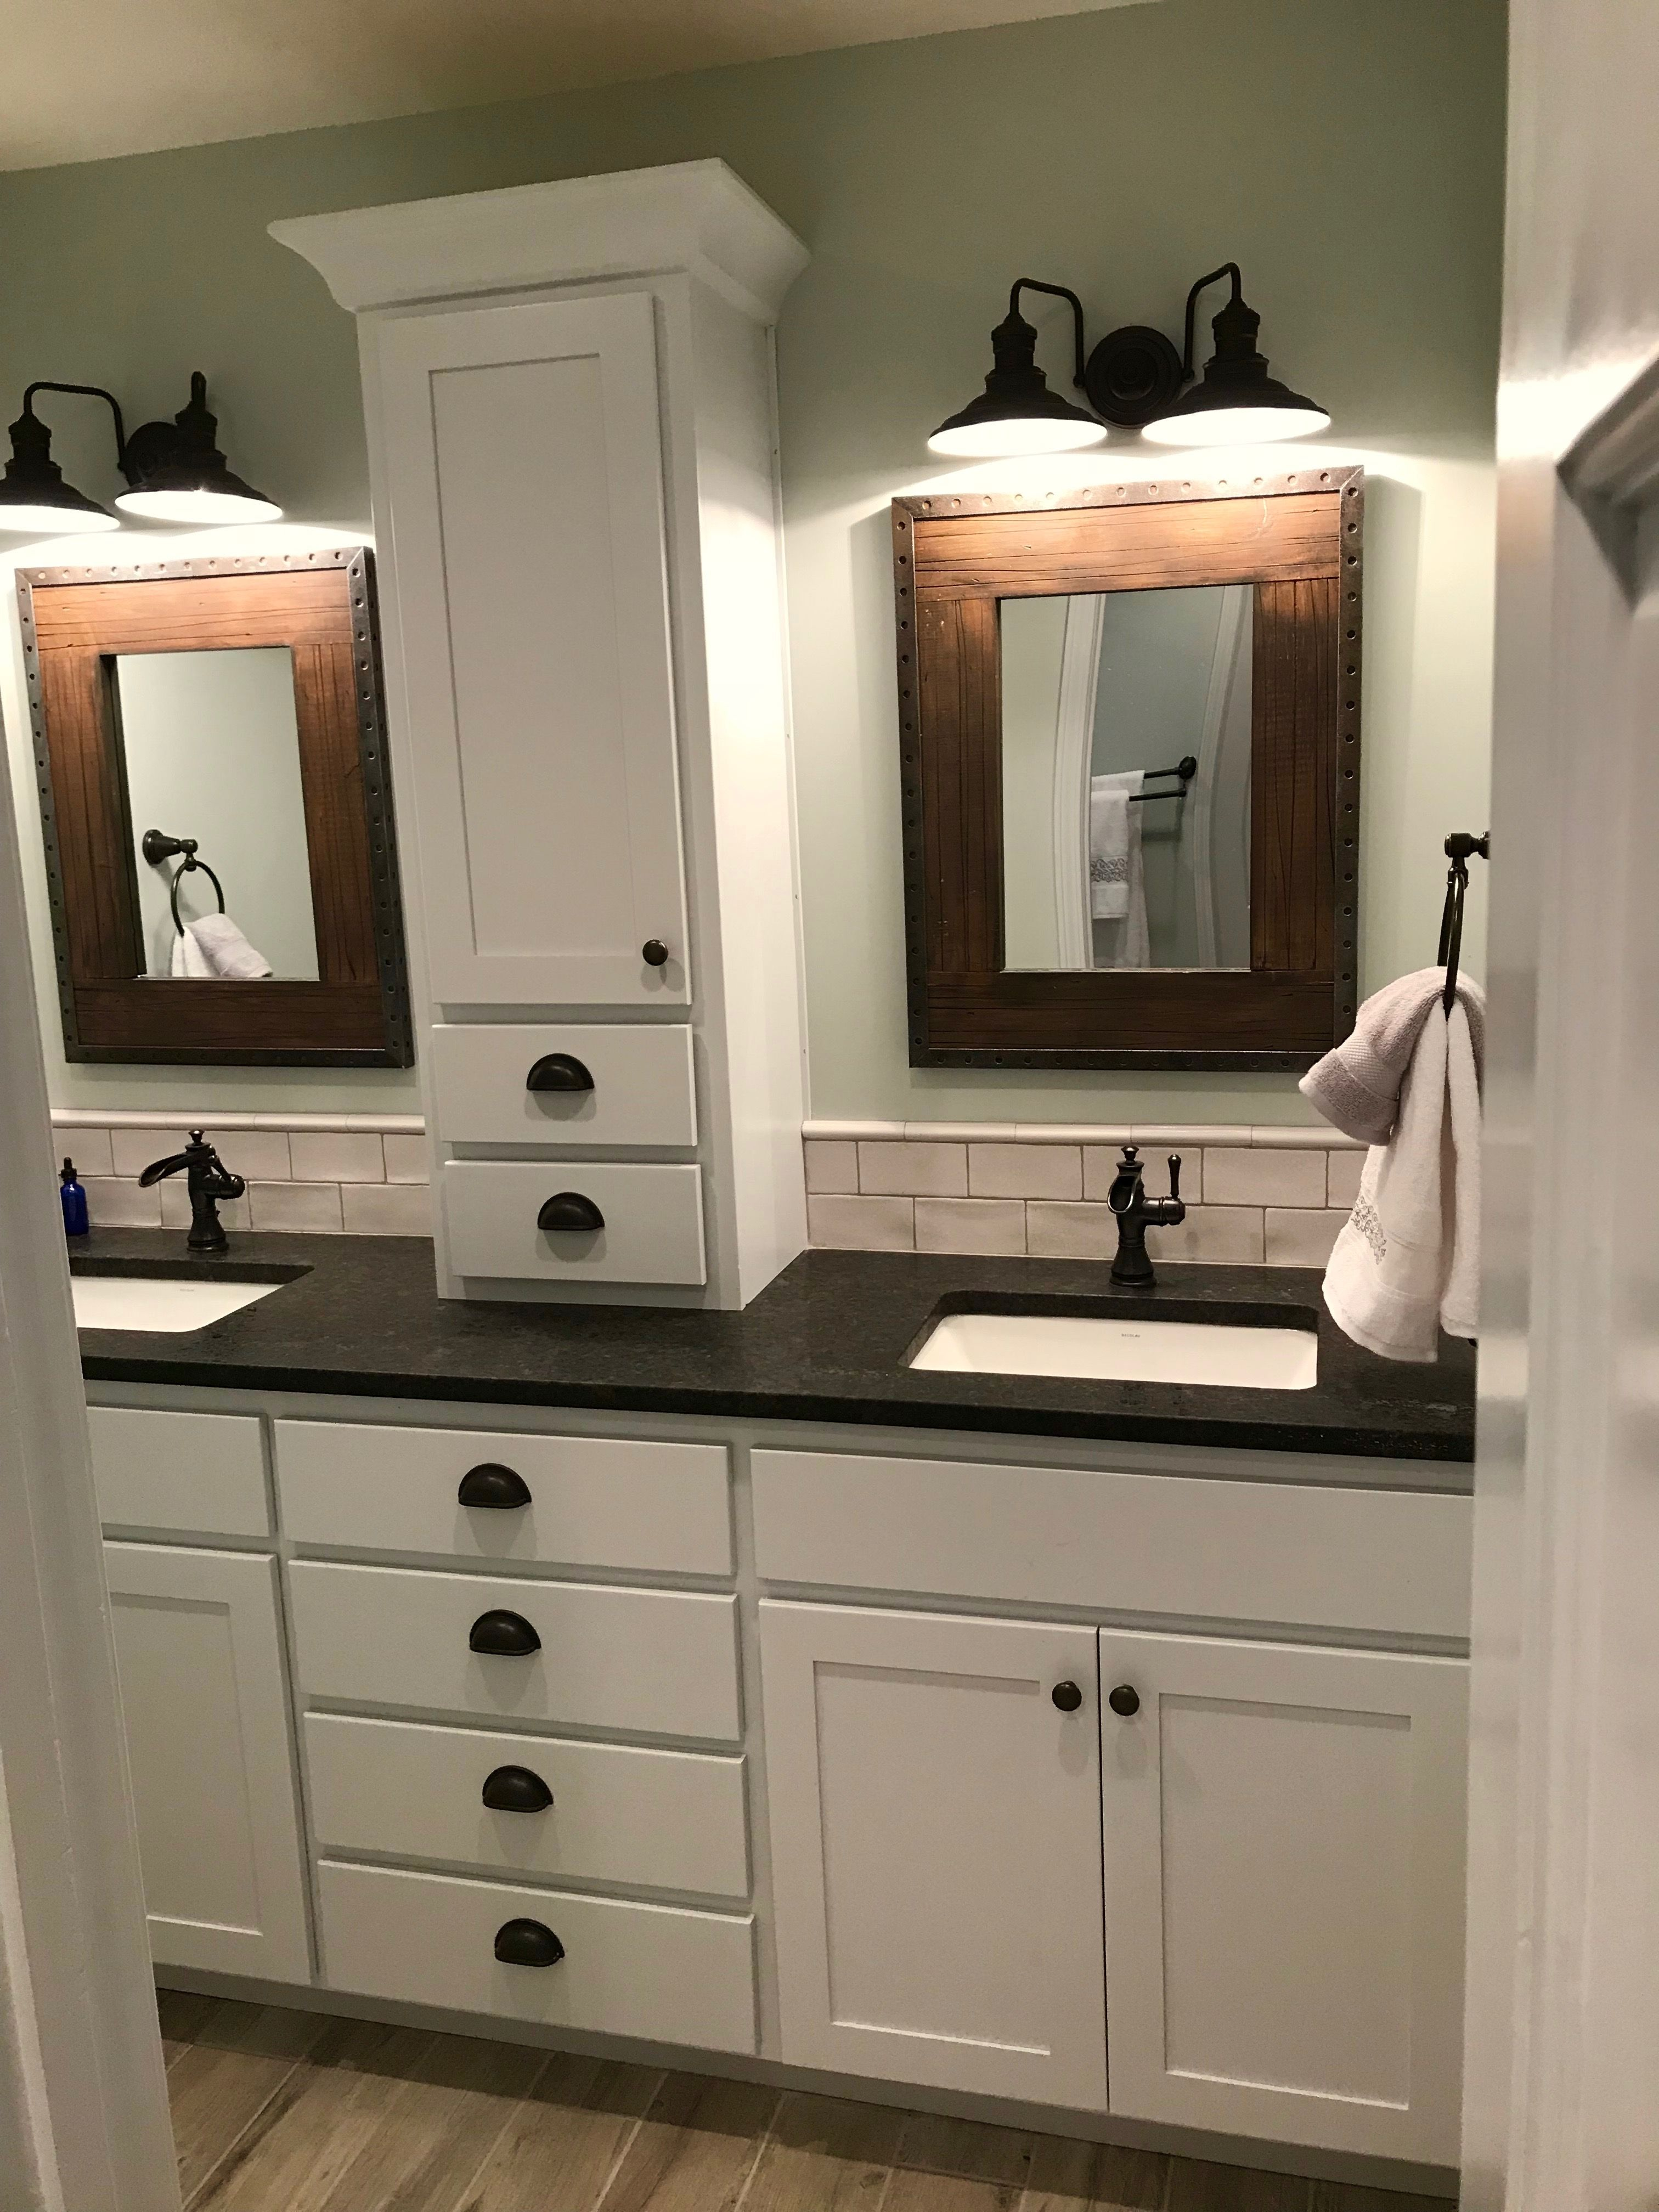 Pin By Jennifer Cooke On Bathe Me Bathroom Vanity Designs Bathroom Remodel Master Bathroom Wall Cabinets